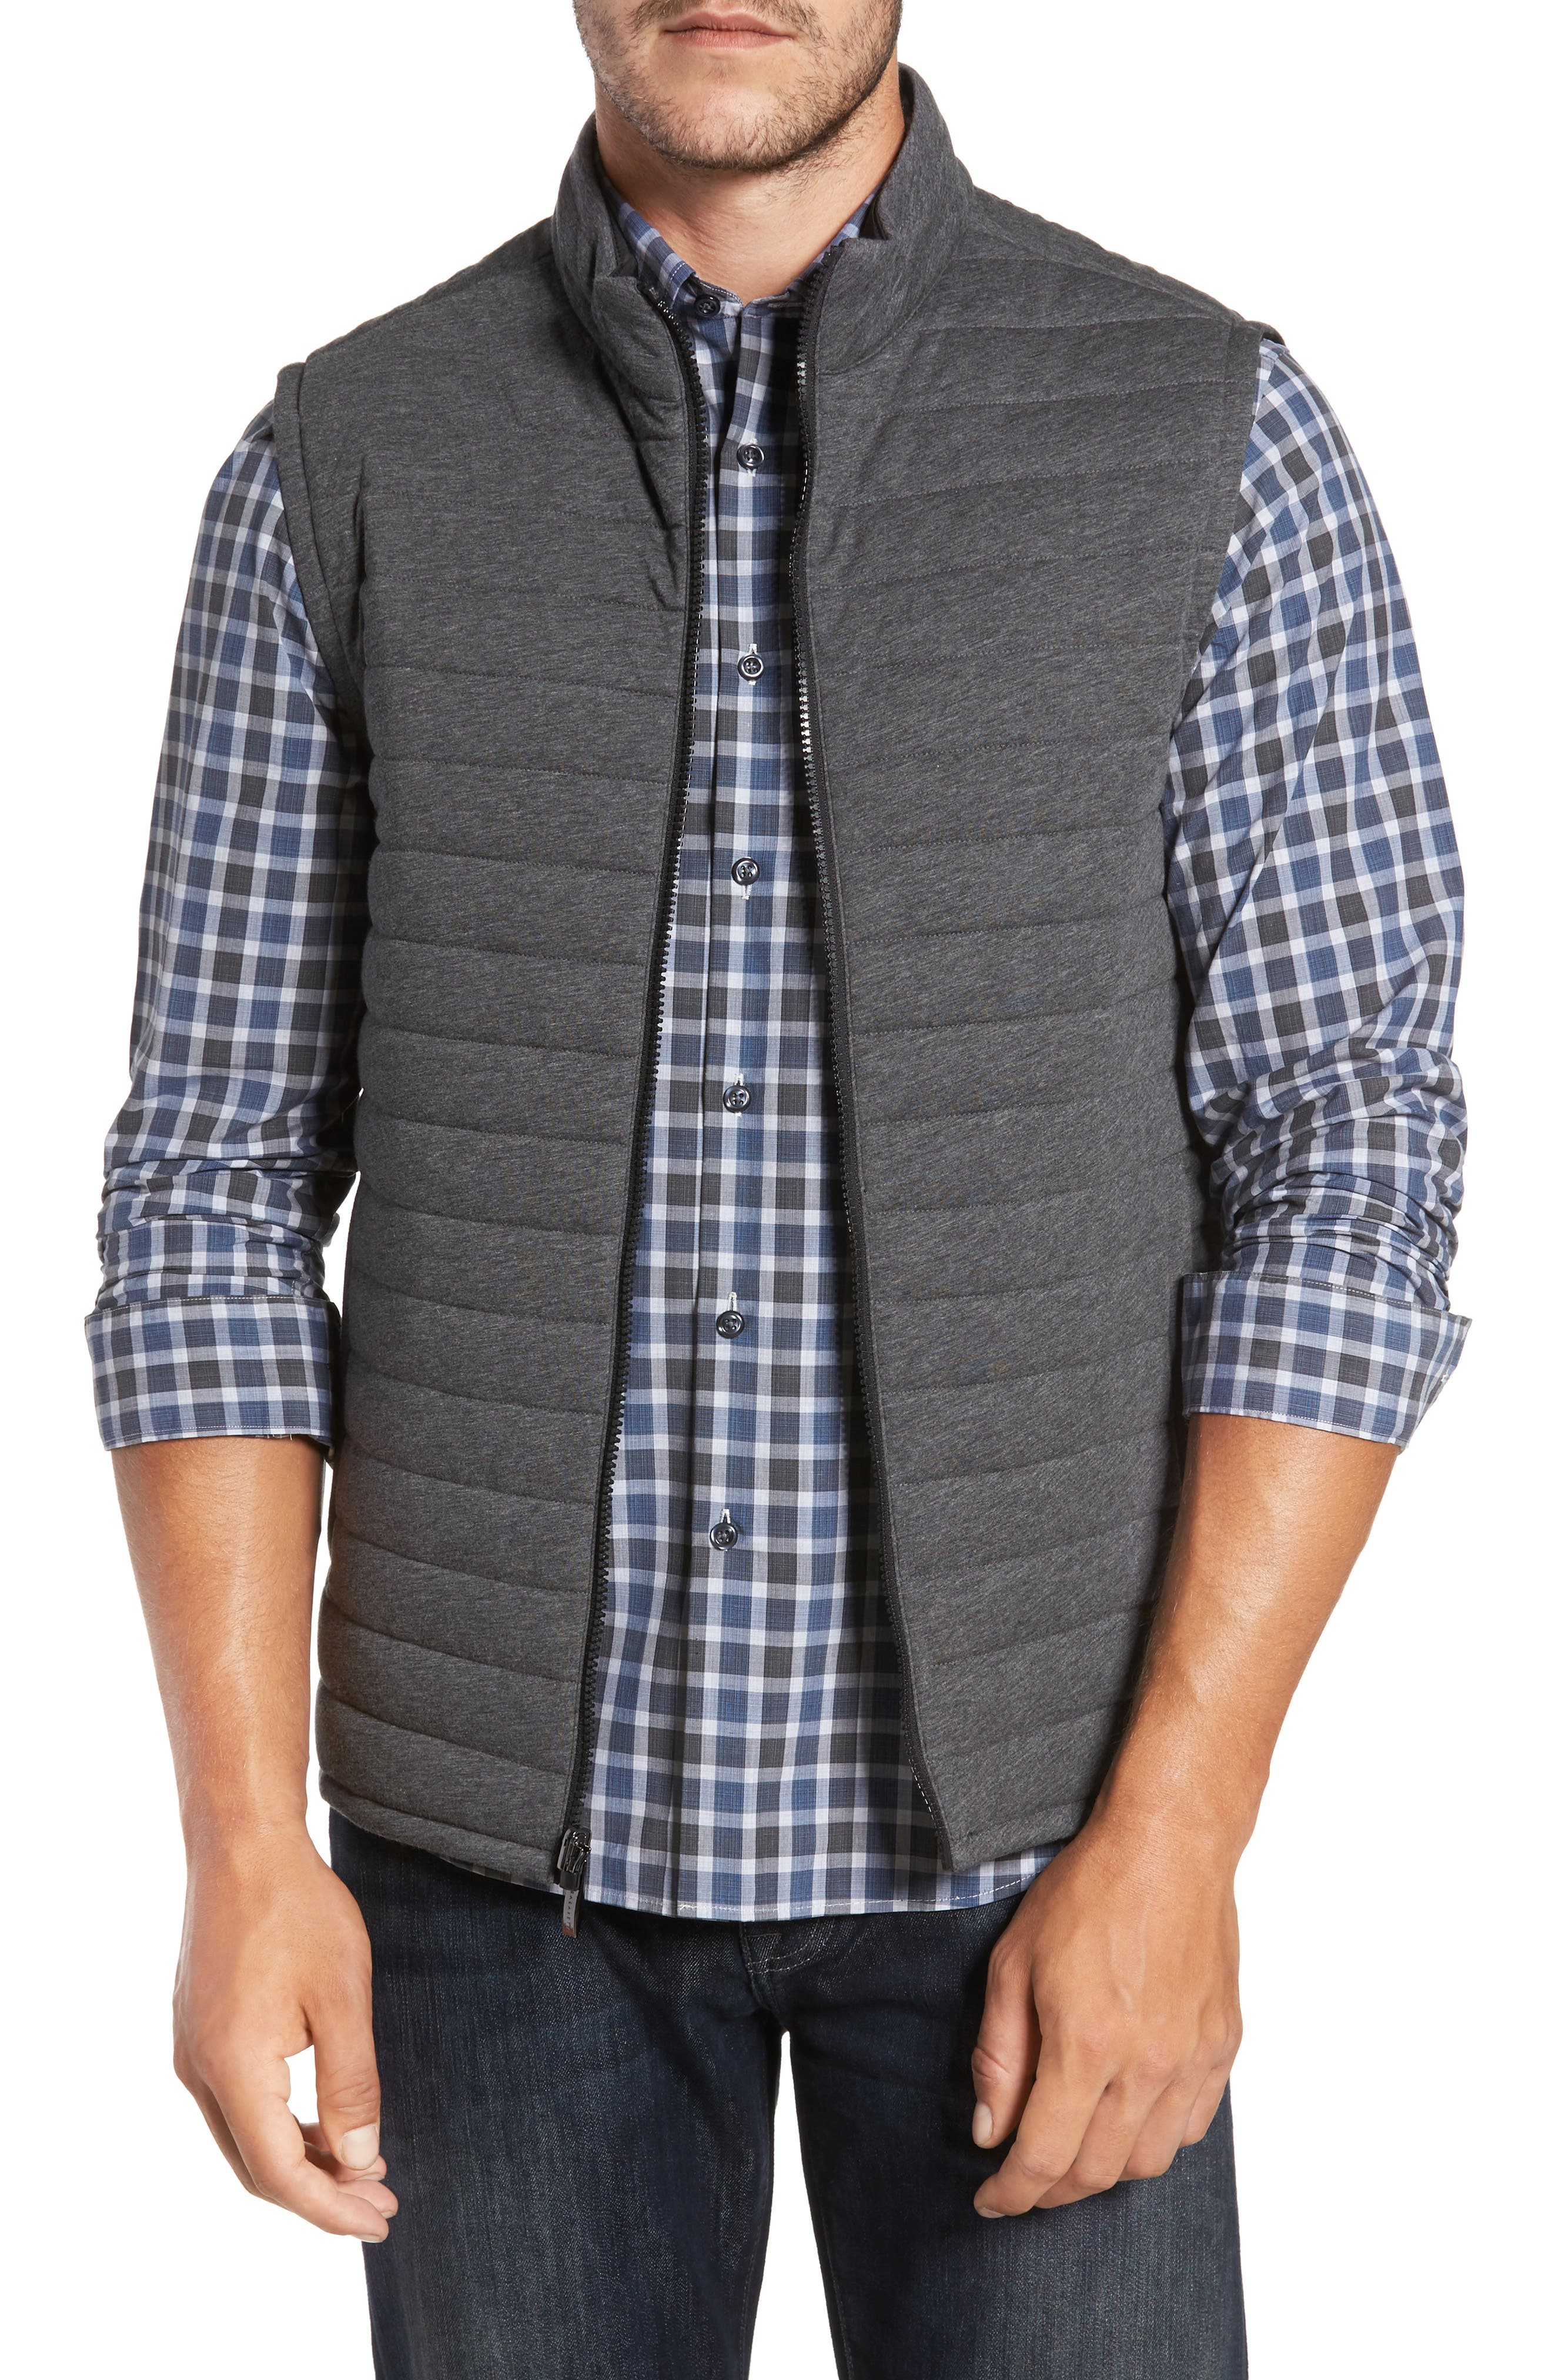 Gallagher Reversible Vest,                             Main thumbnail 1, color,                             CHARCOAL